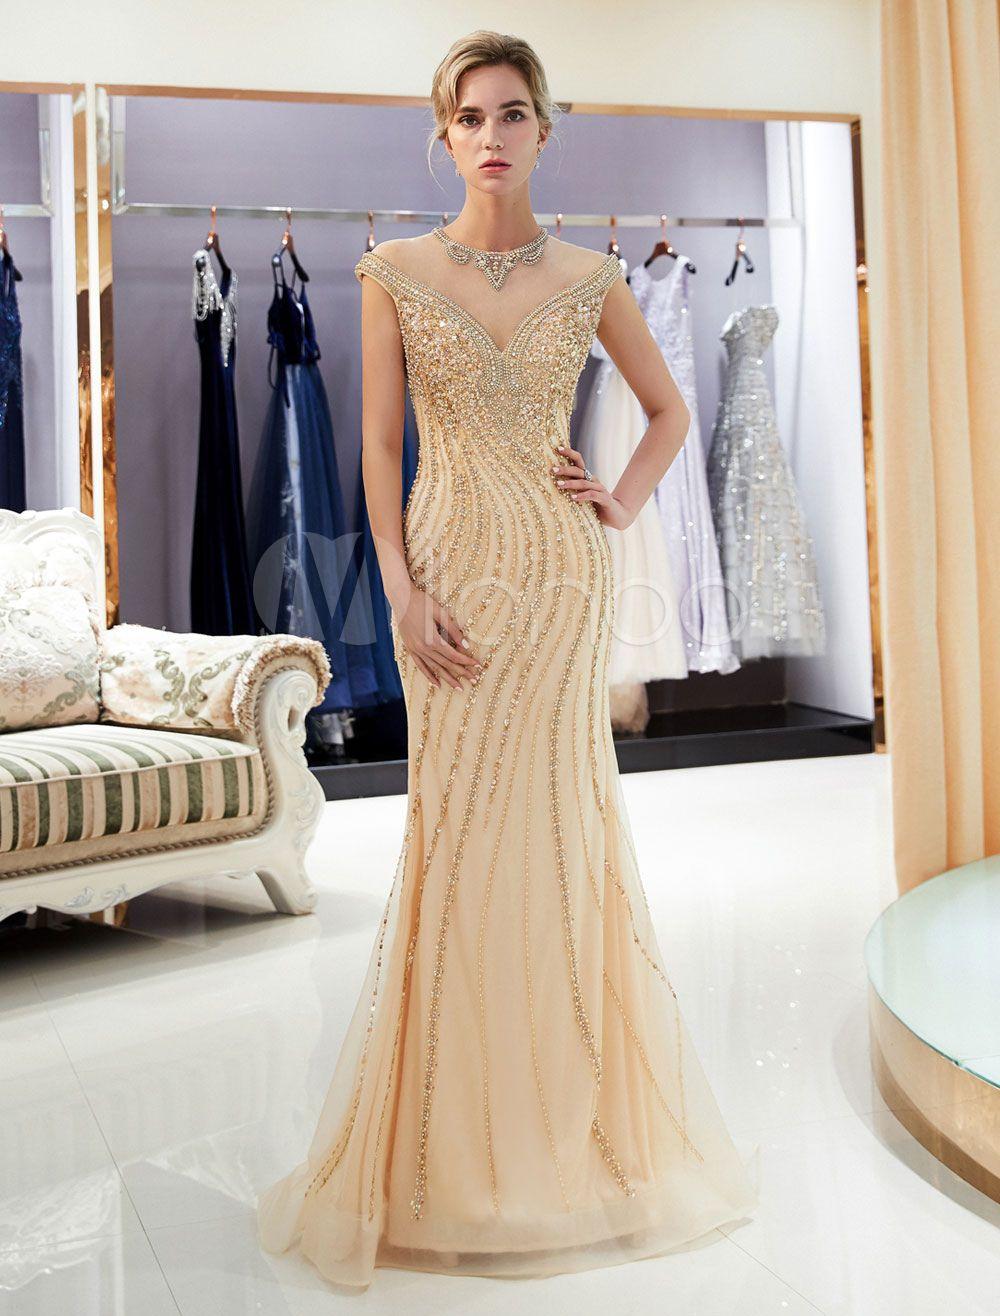 4f9de50b782 Mermaid Prom Dresses Light Gold Beaded Sleeveless Luxury Formal Evening  Dress With Train  Light